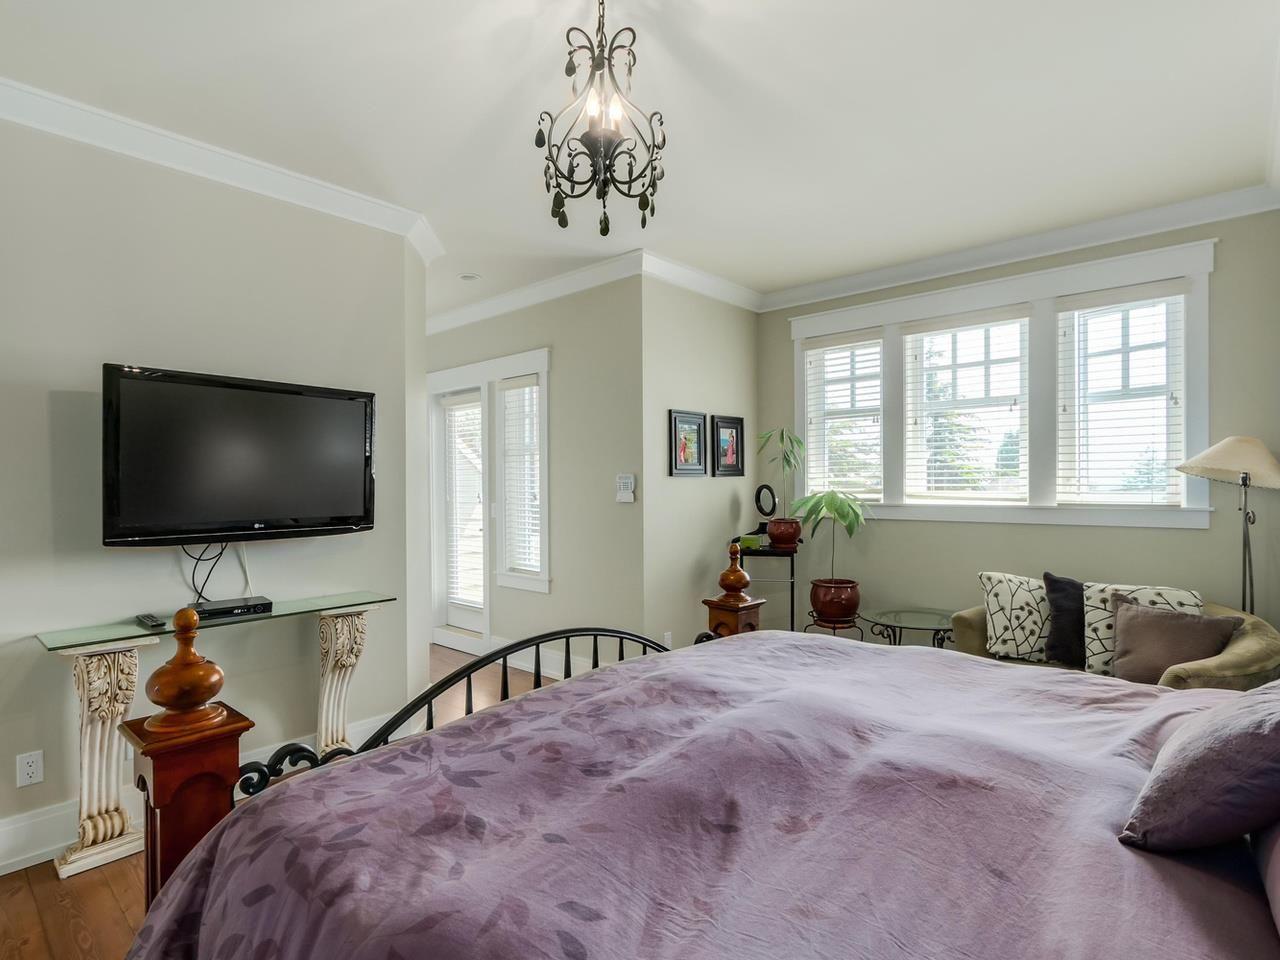 Photo 12: Photos: 13029 14 Avenue in Surrey: Crescent Bch Ocean Pk. House for sale (South Surrey White Rock)  : MLS®# R2070160